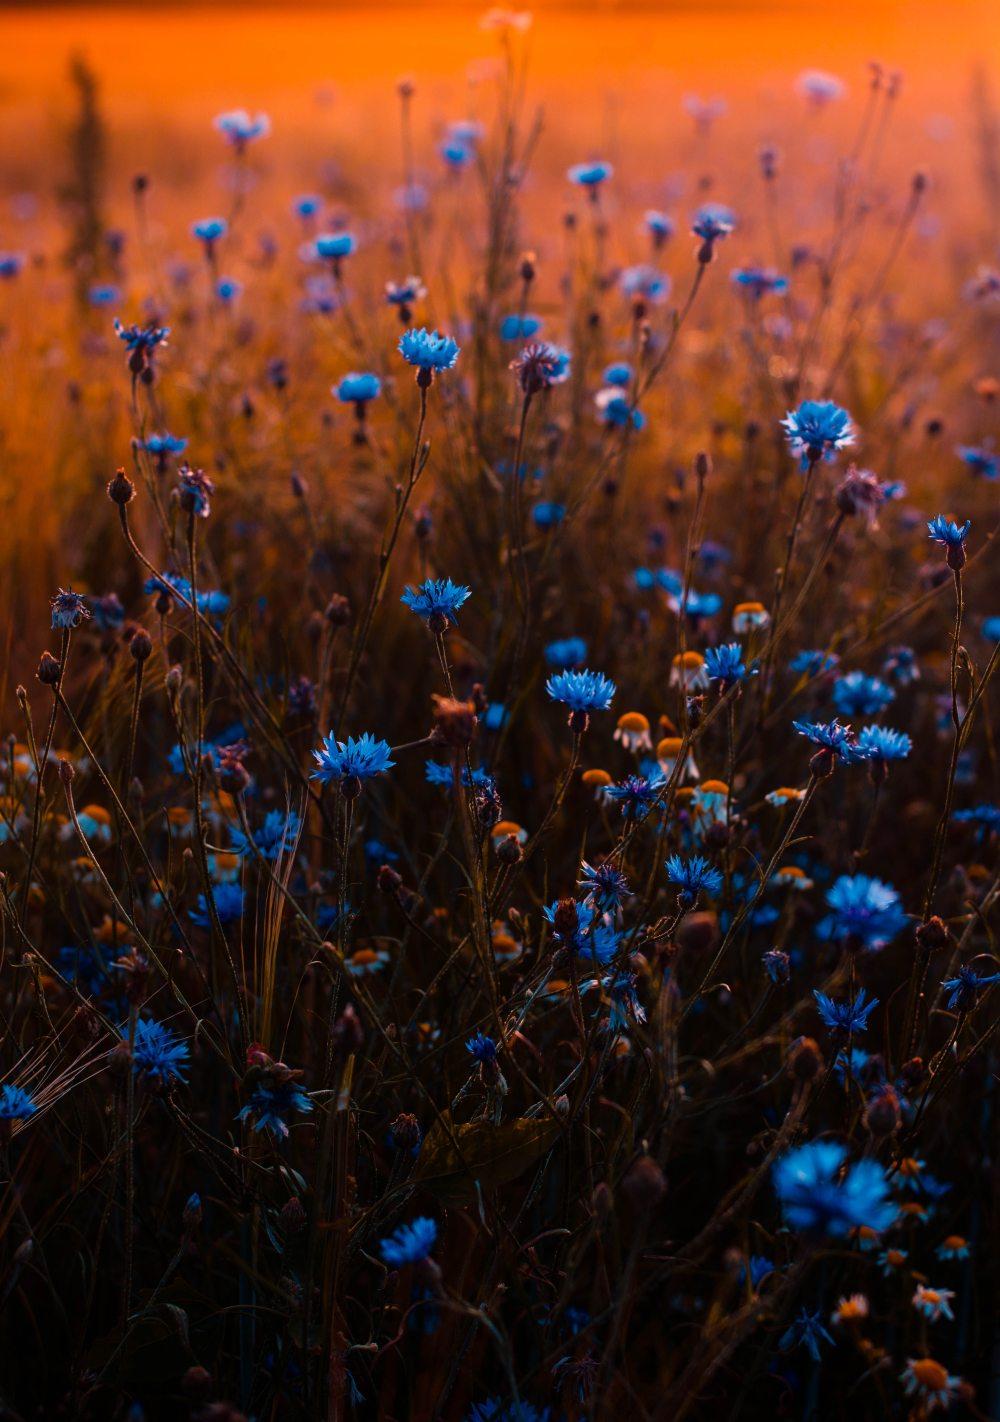 blue-flowers-blur-buds-673857